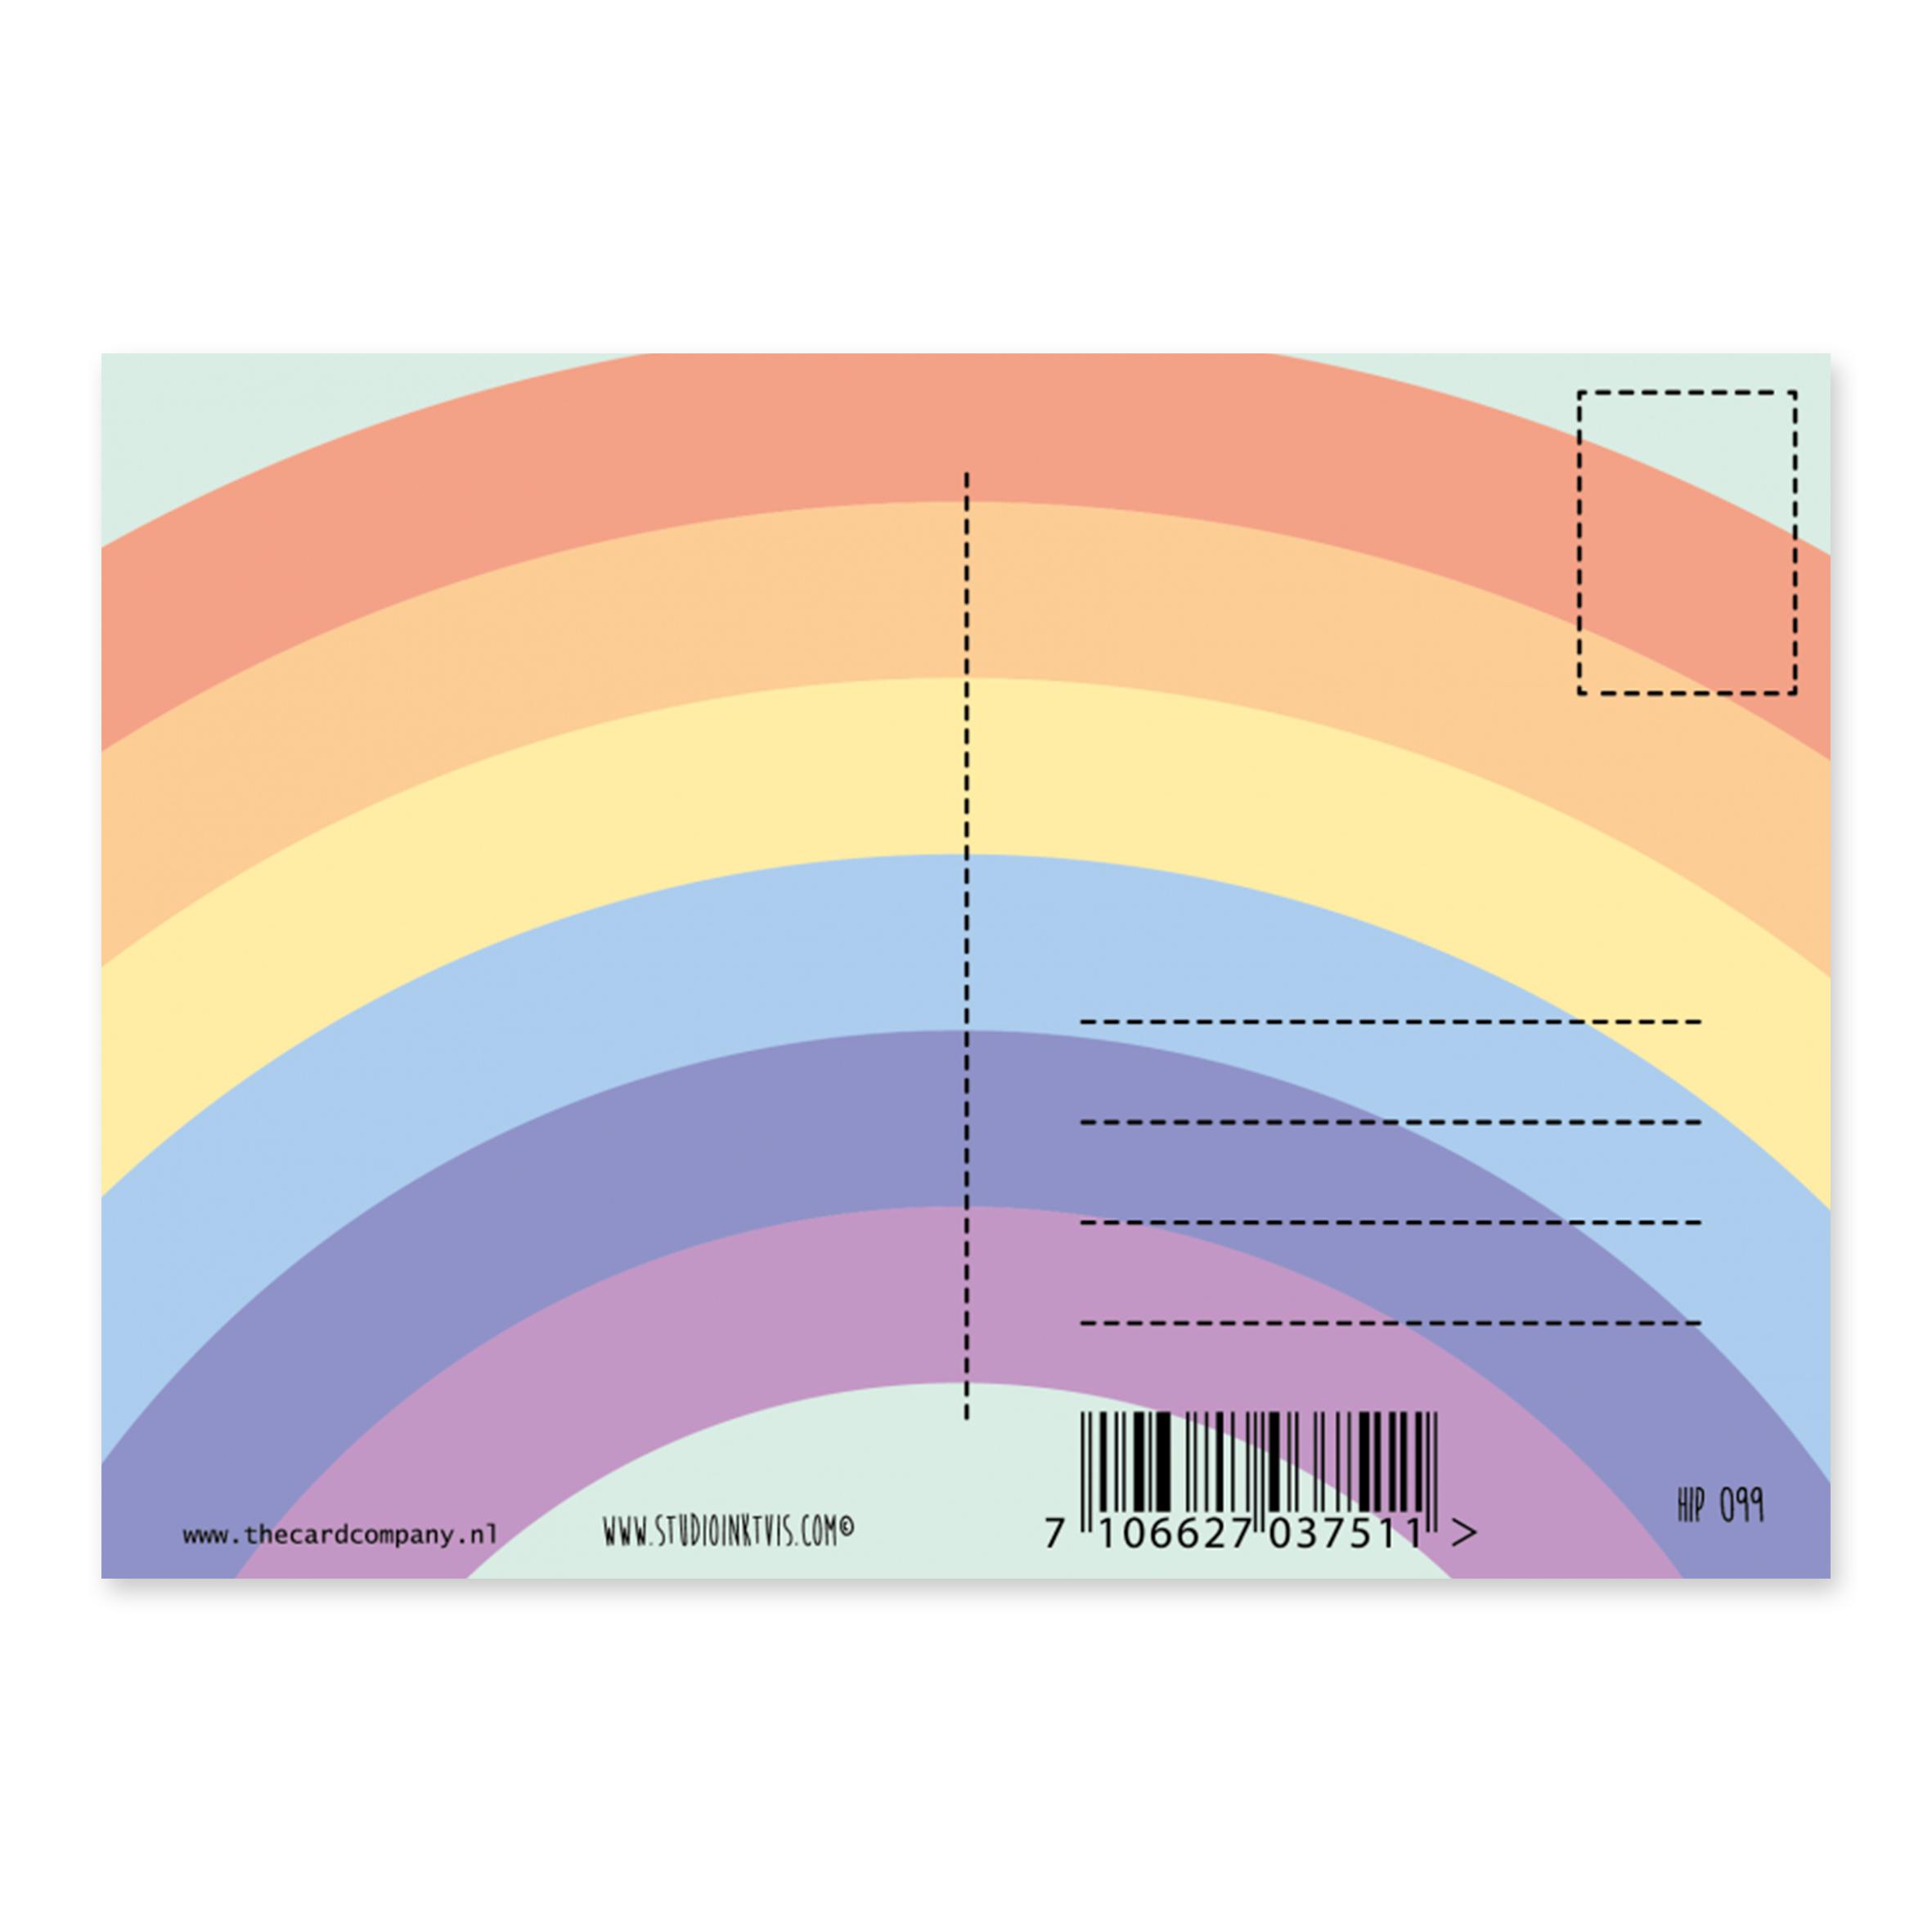 studioinktvis-kaart-followyourrainbow-achterkant